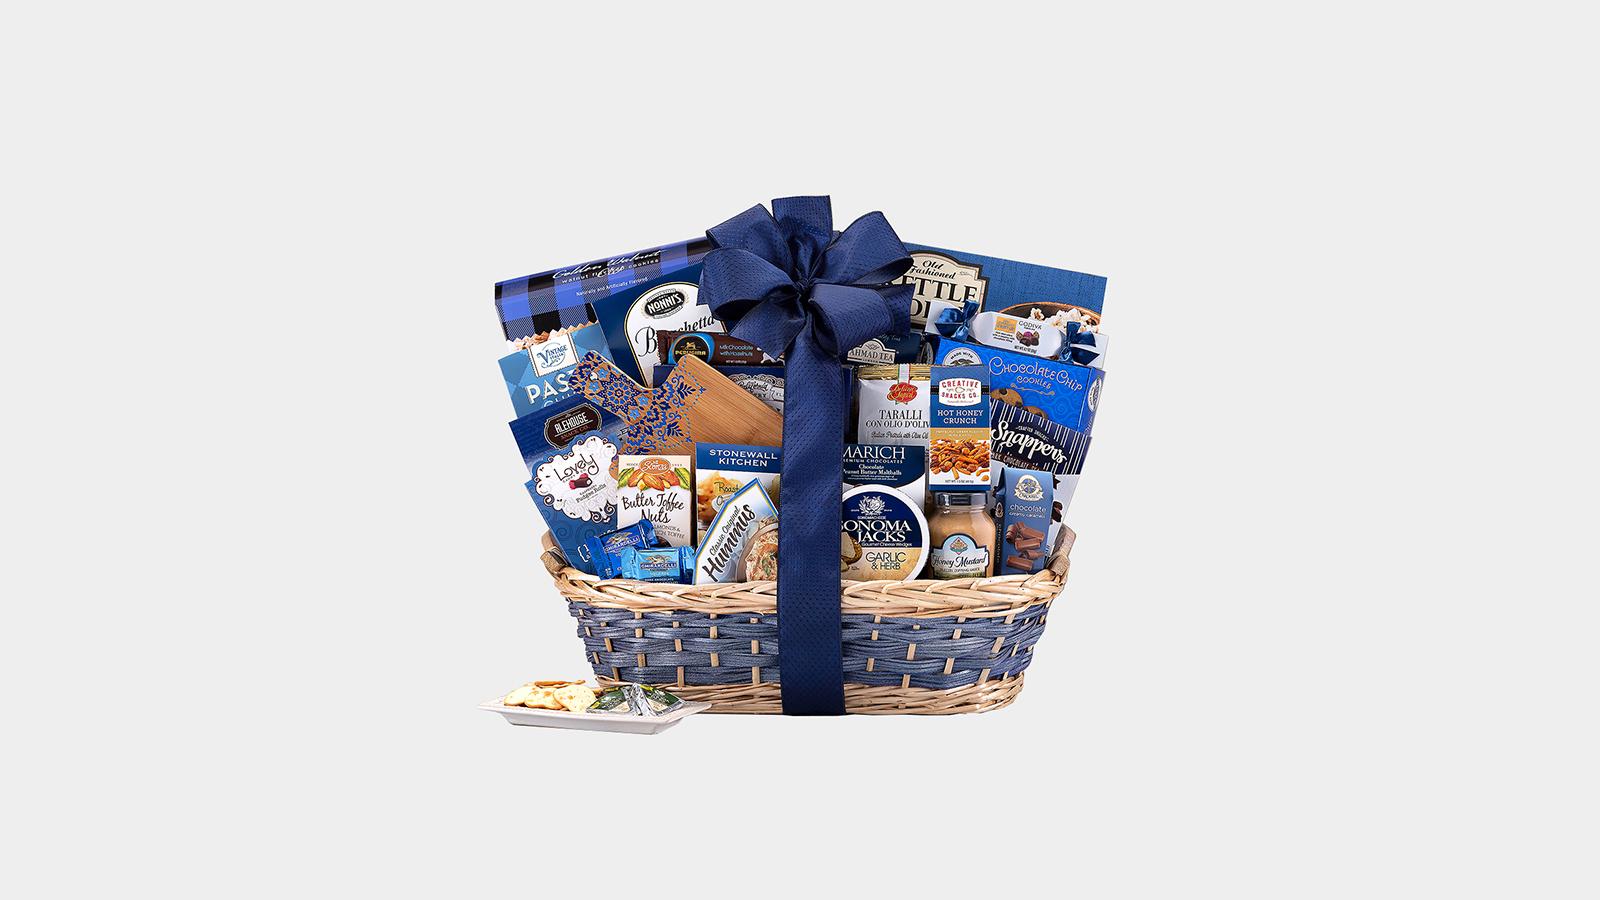 The Fresh Market Gift Cards & Baskets | Order Online - The Fresh Market